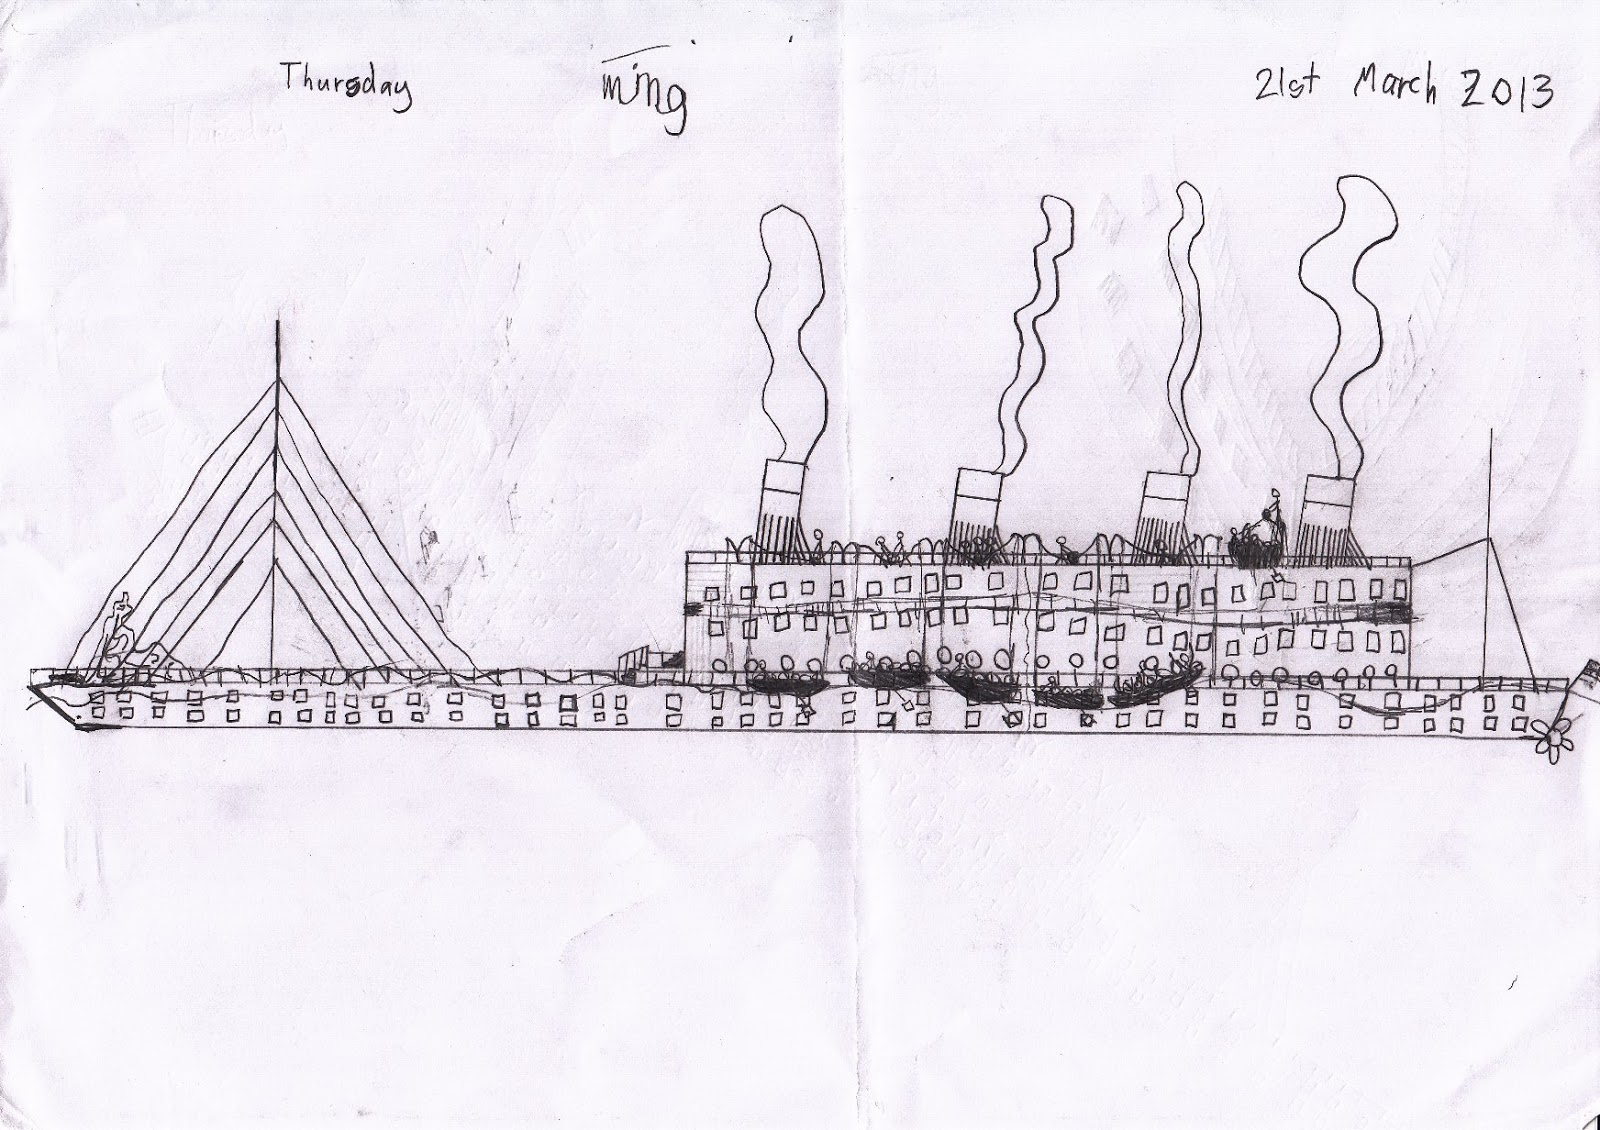 hight resolution of rms titanic 15 apr 2013